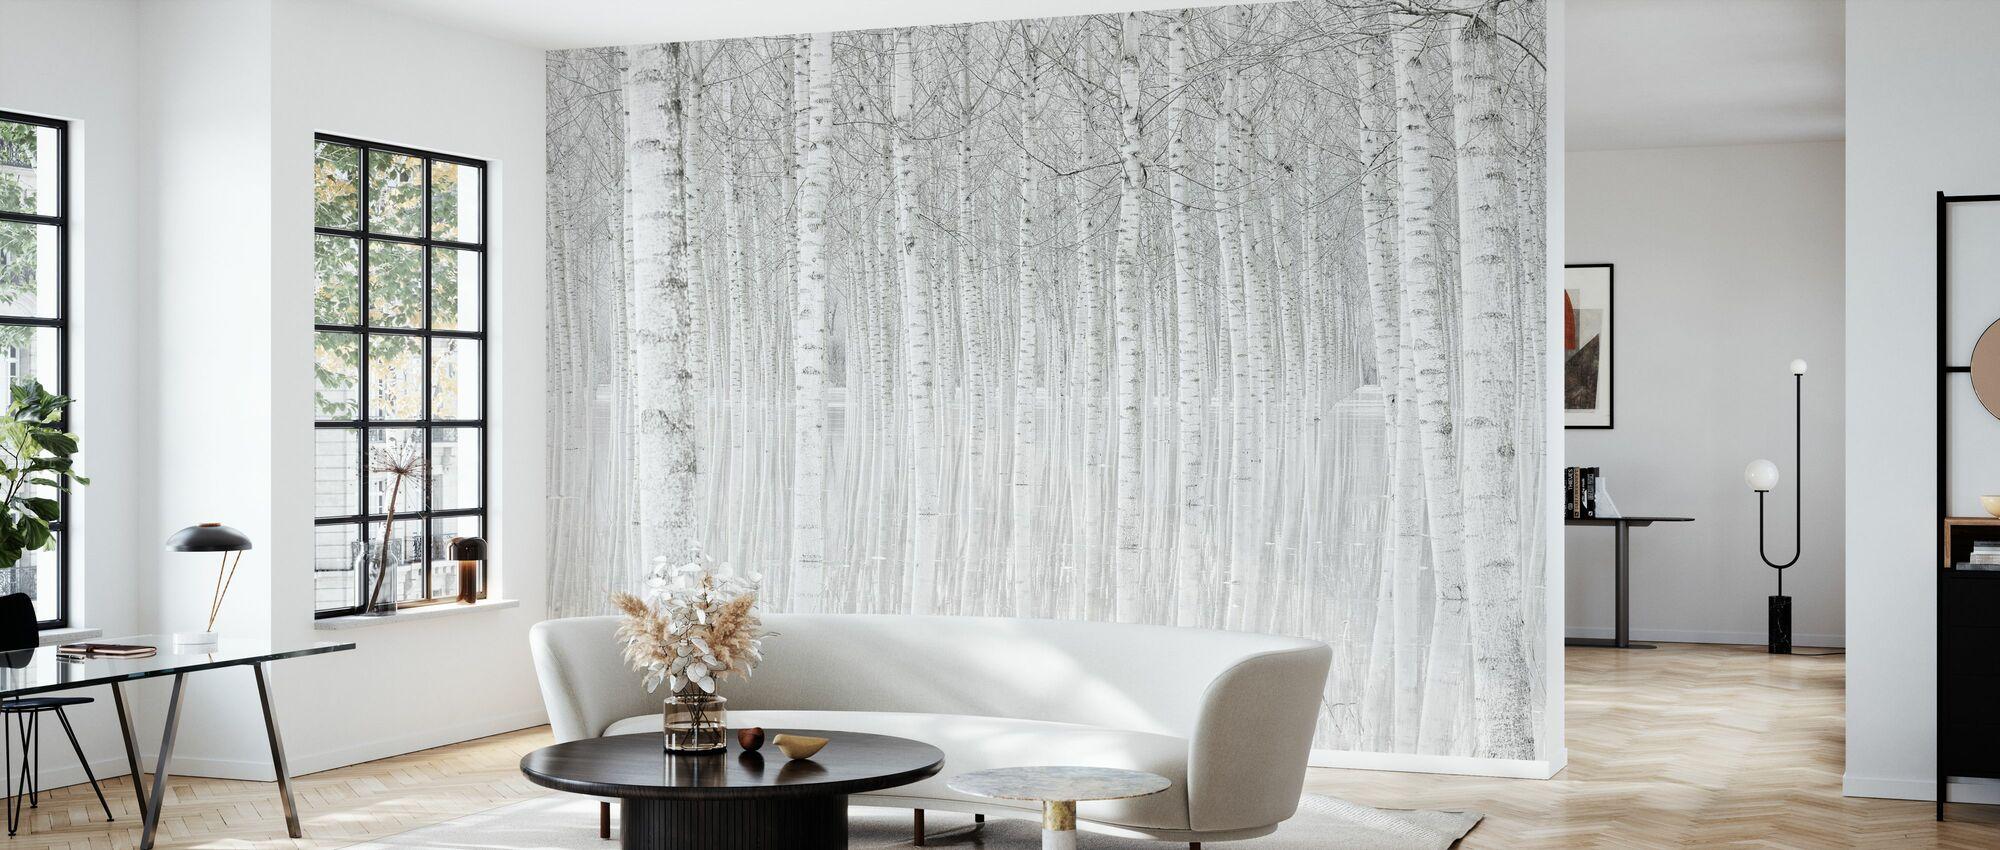 Trees - Wallpaper - Living Room